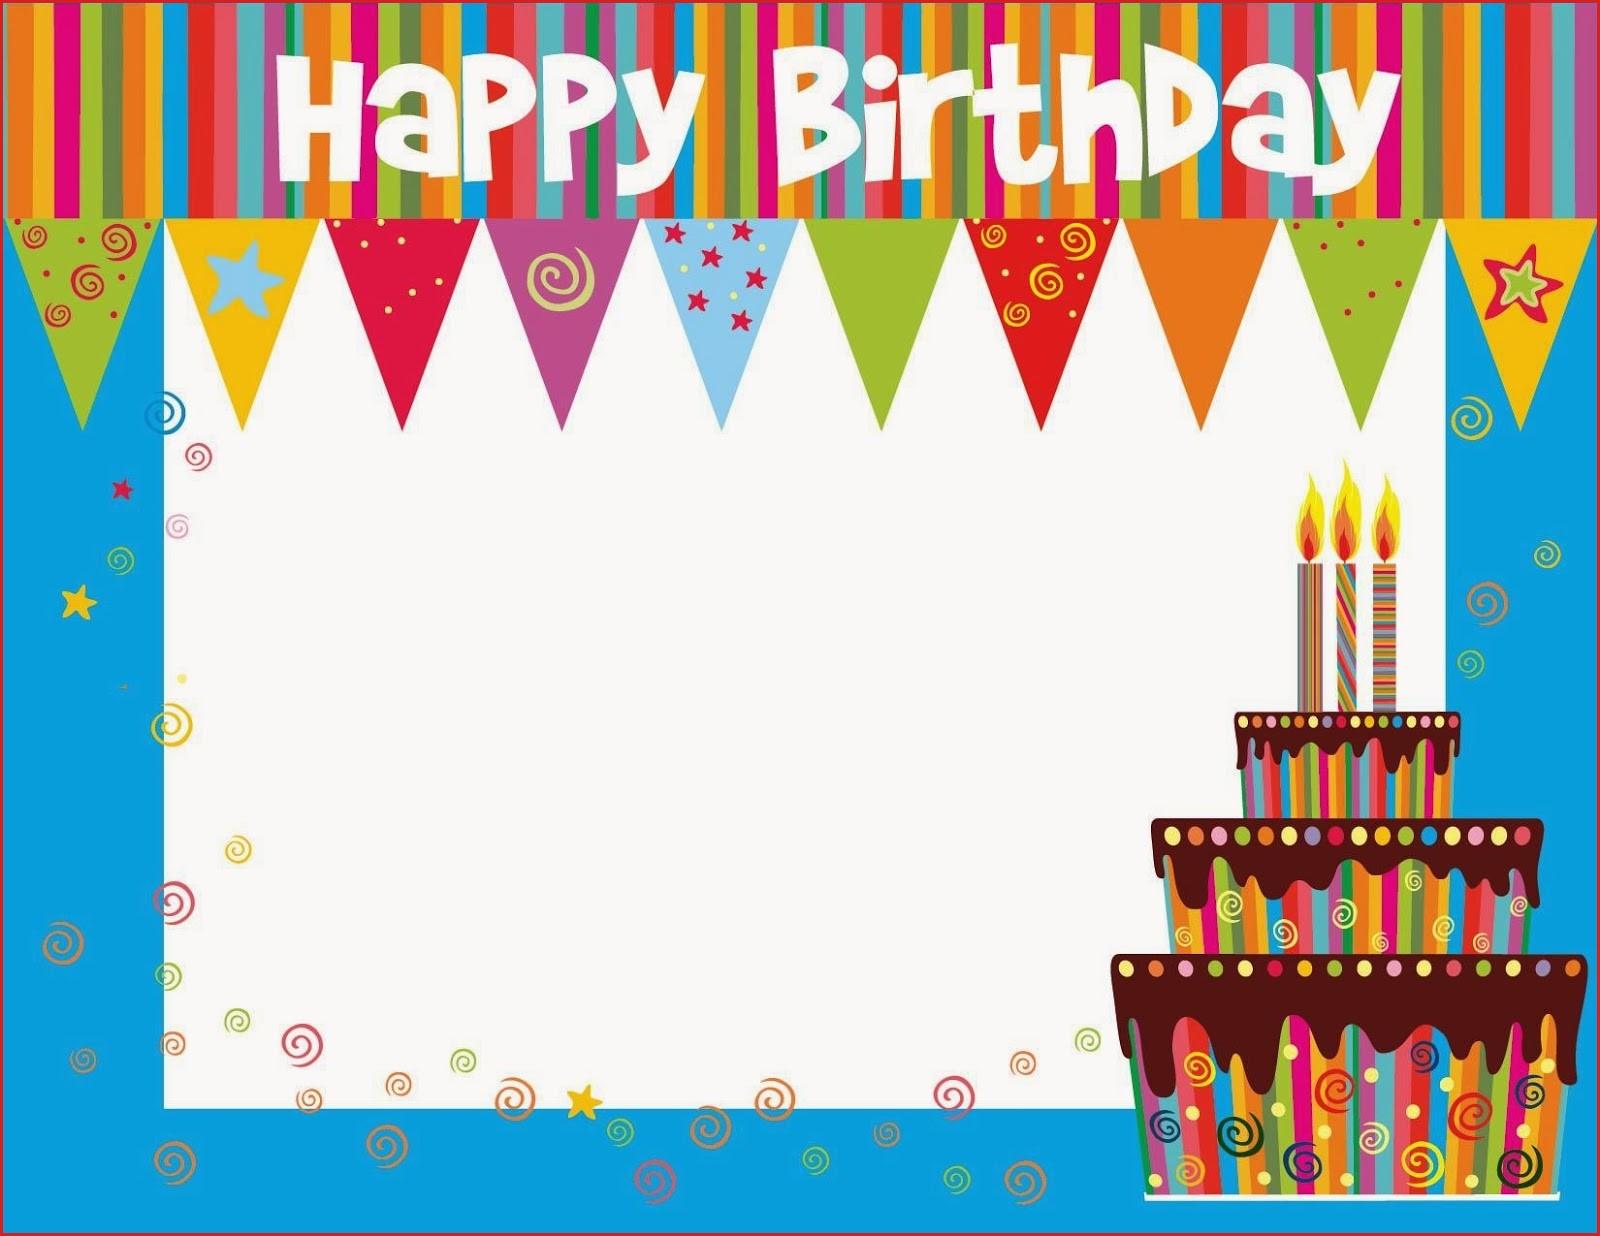 Create Birthday Cards Online Free Printable Birthday Cards Ideas - Free Printable Greeting Card Templates